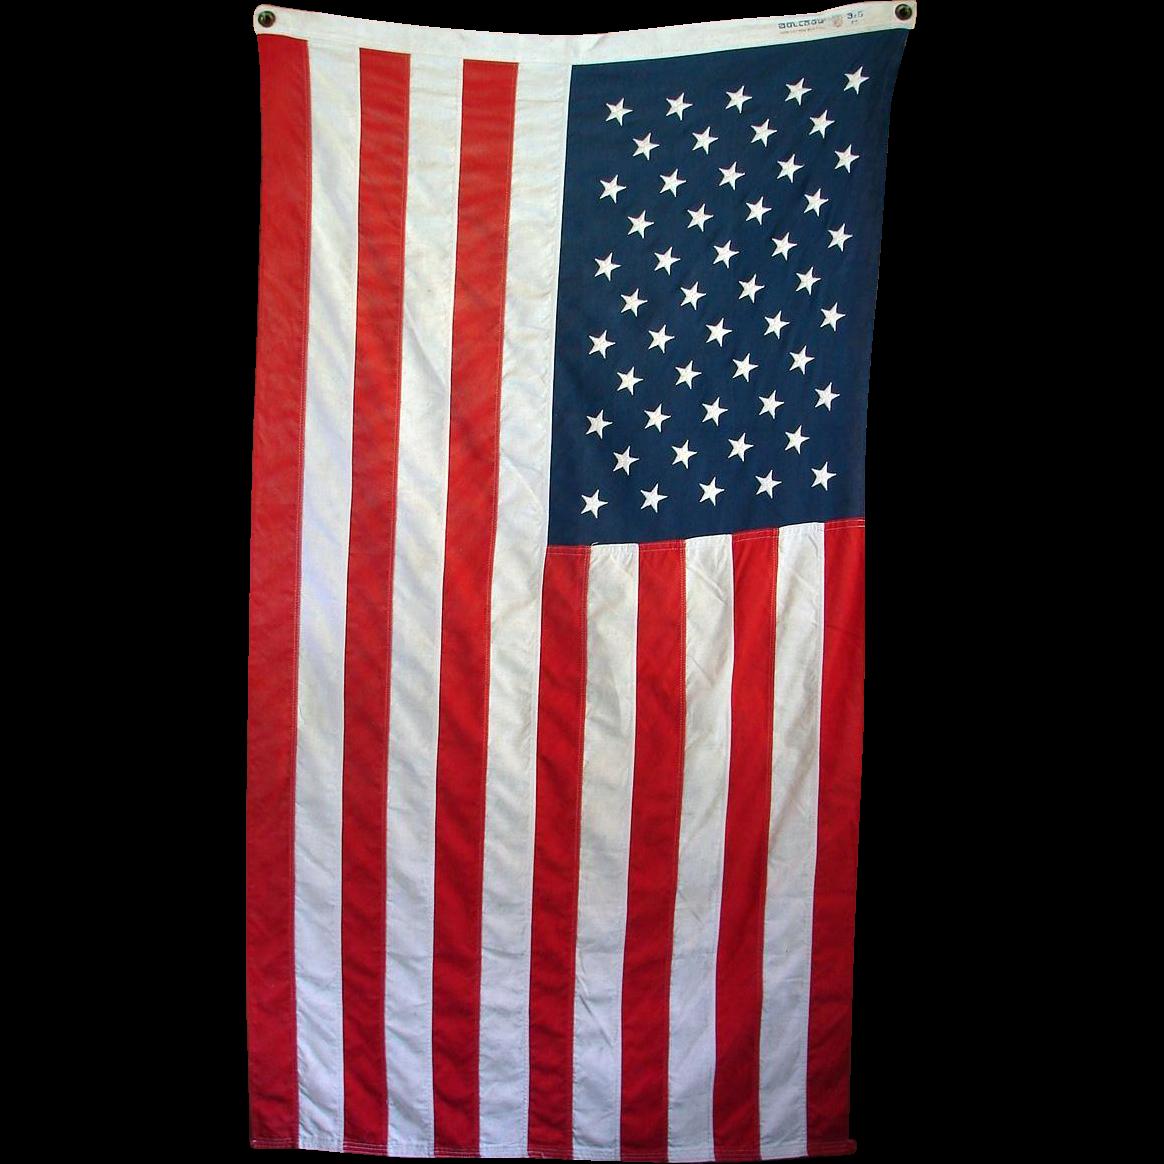 50 star american flag